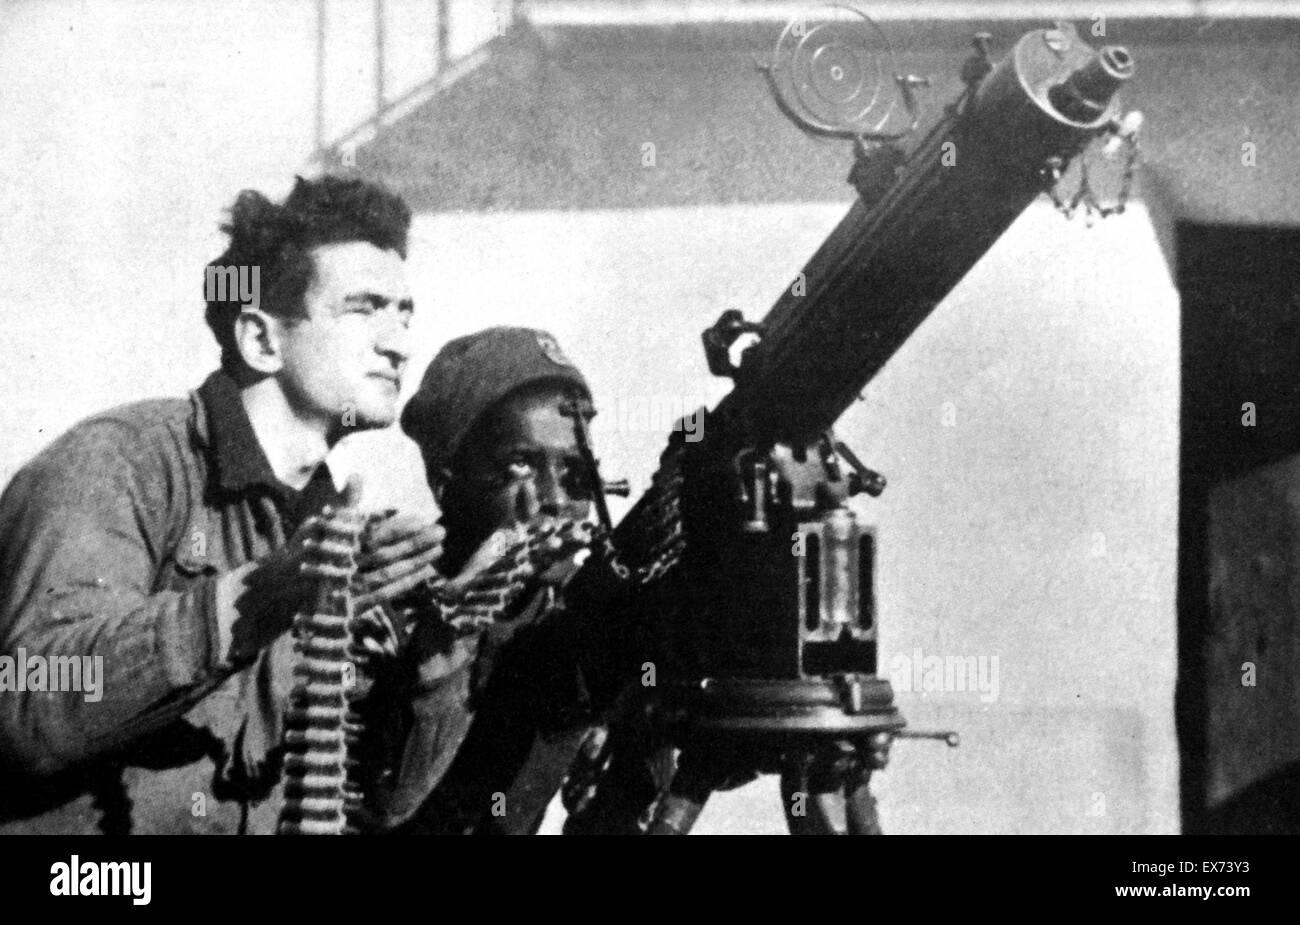 10 Most Influential Weapons of World War Two - Toptenz.net  |Anti Aircraft Guns Spanish Civil War